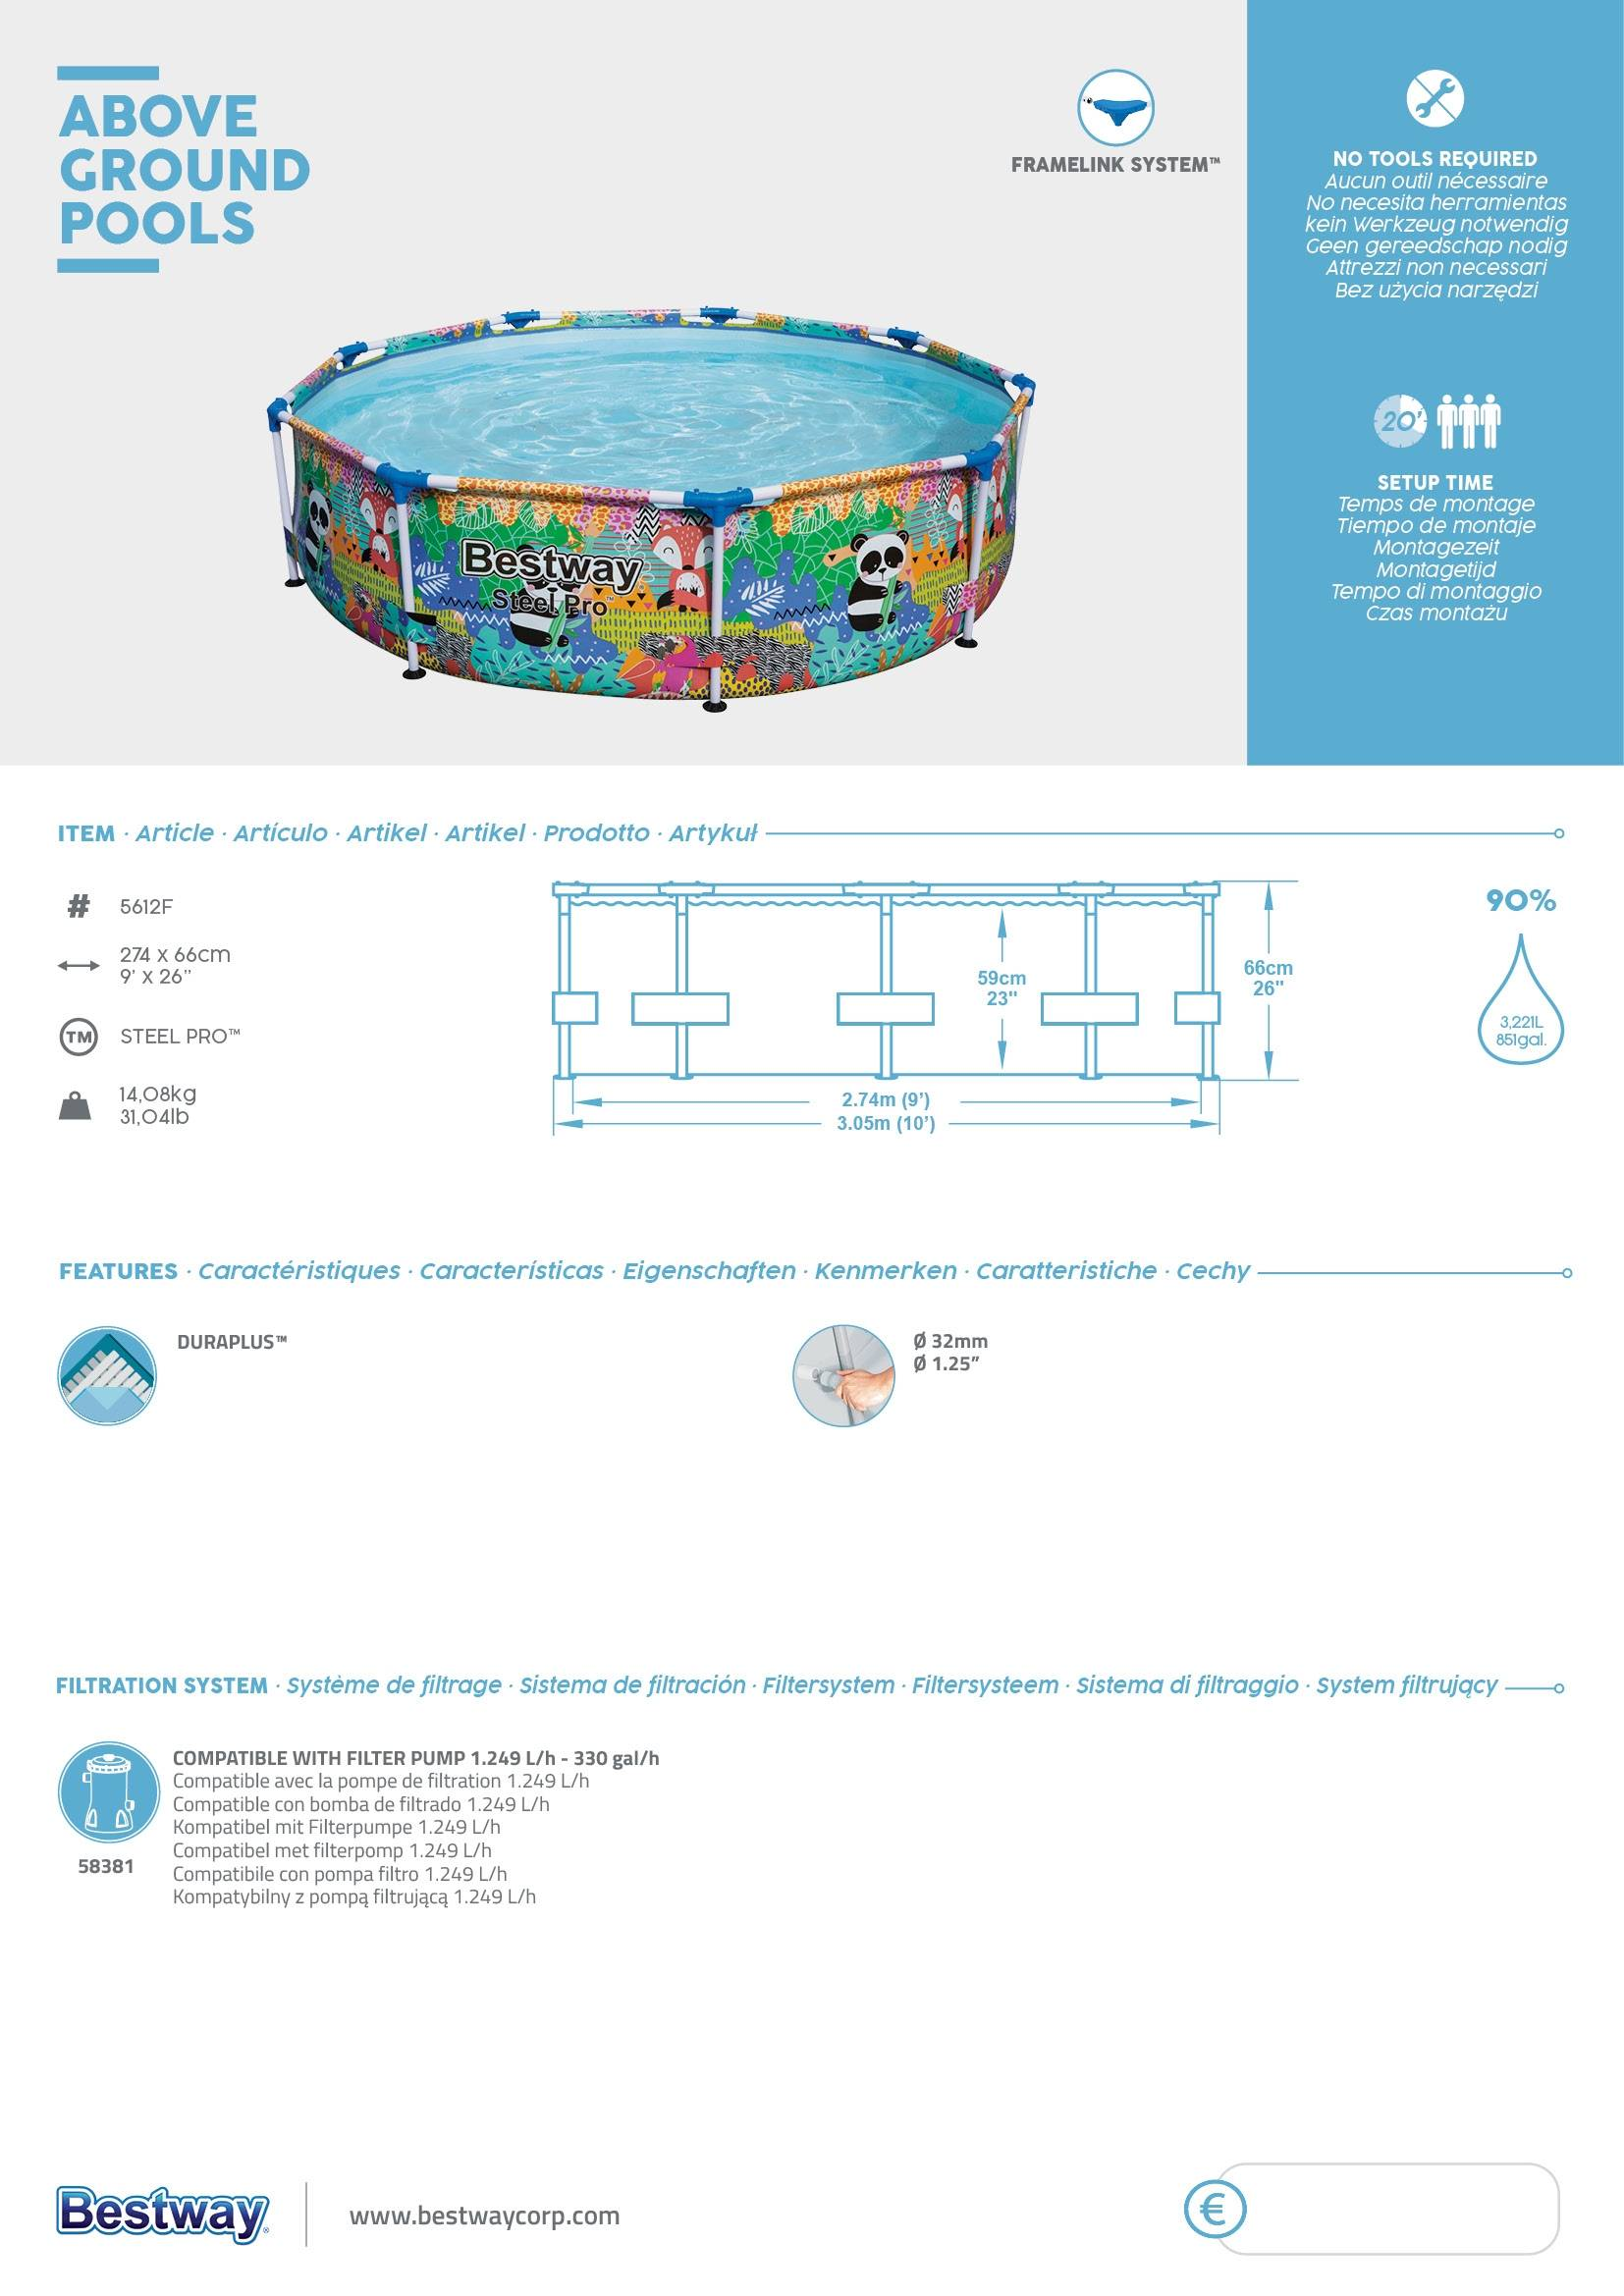 PIscina desmontable tubular infantil Bestway Steel Pro 274x66cm animales